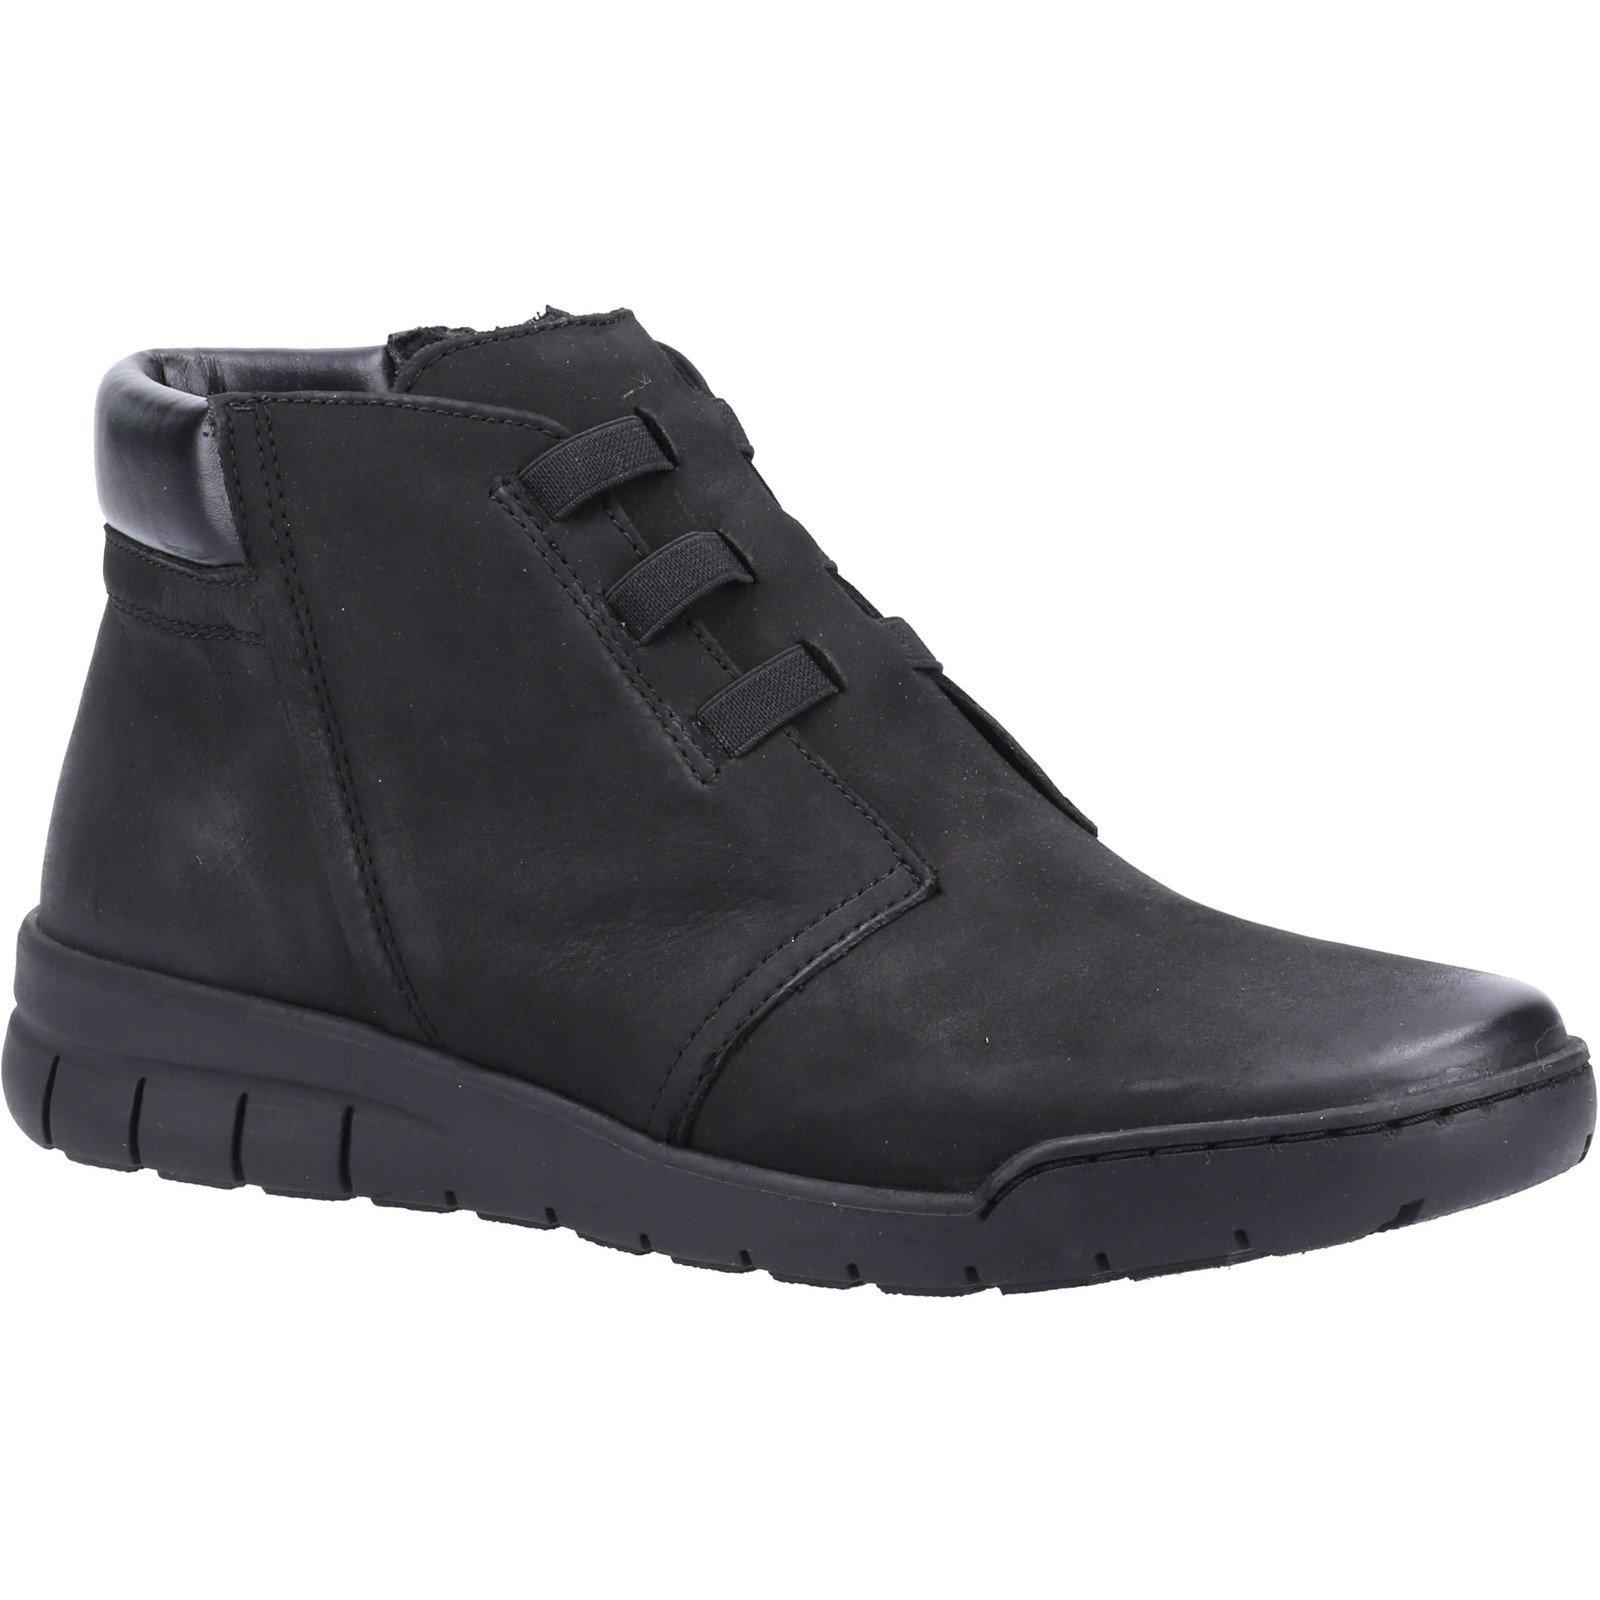 Fleet & Foster Women's Carmen Zip Ankle Boot Various Colours 33017 - Black 3